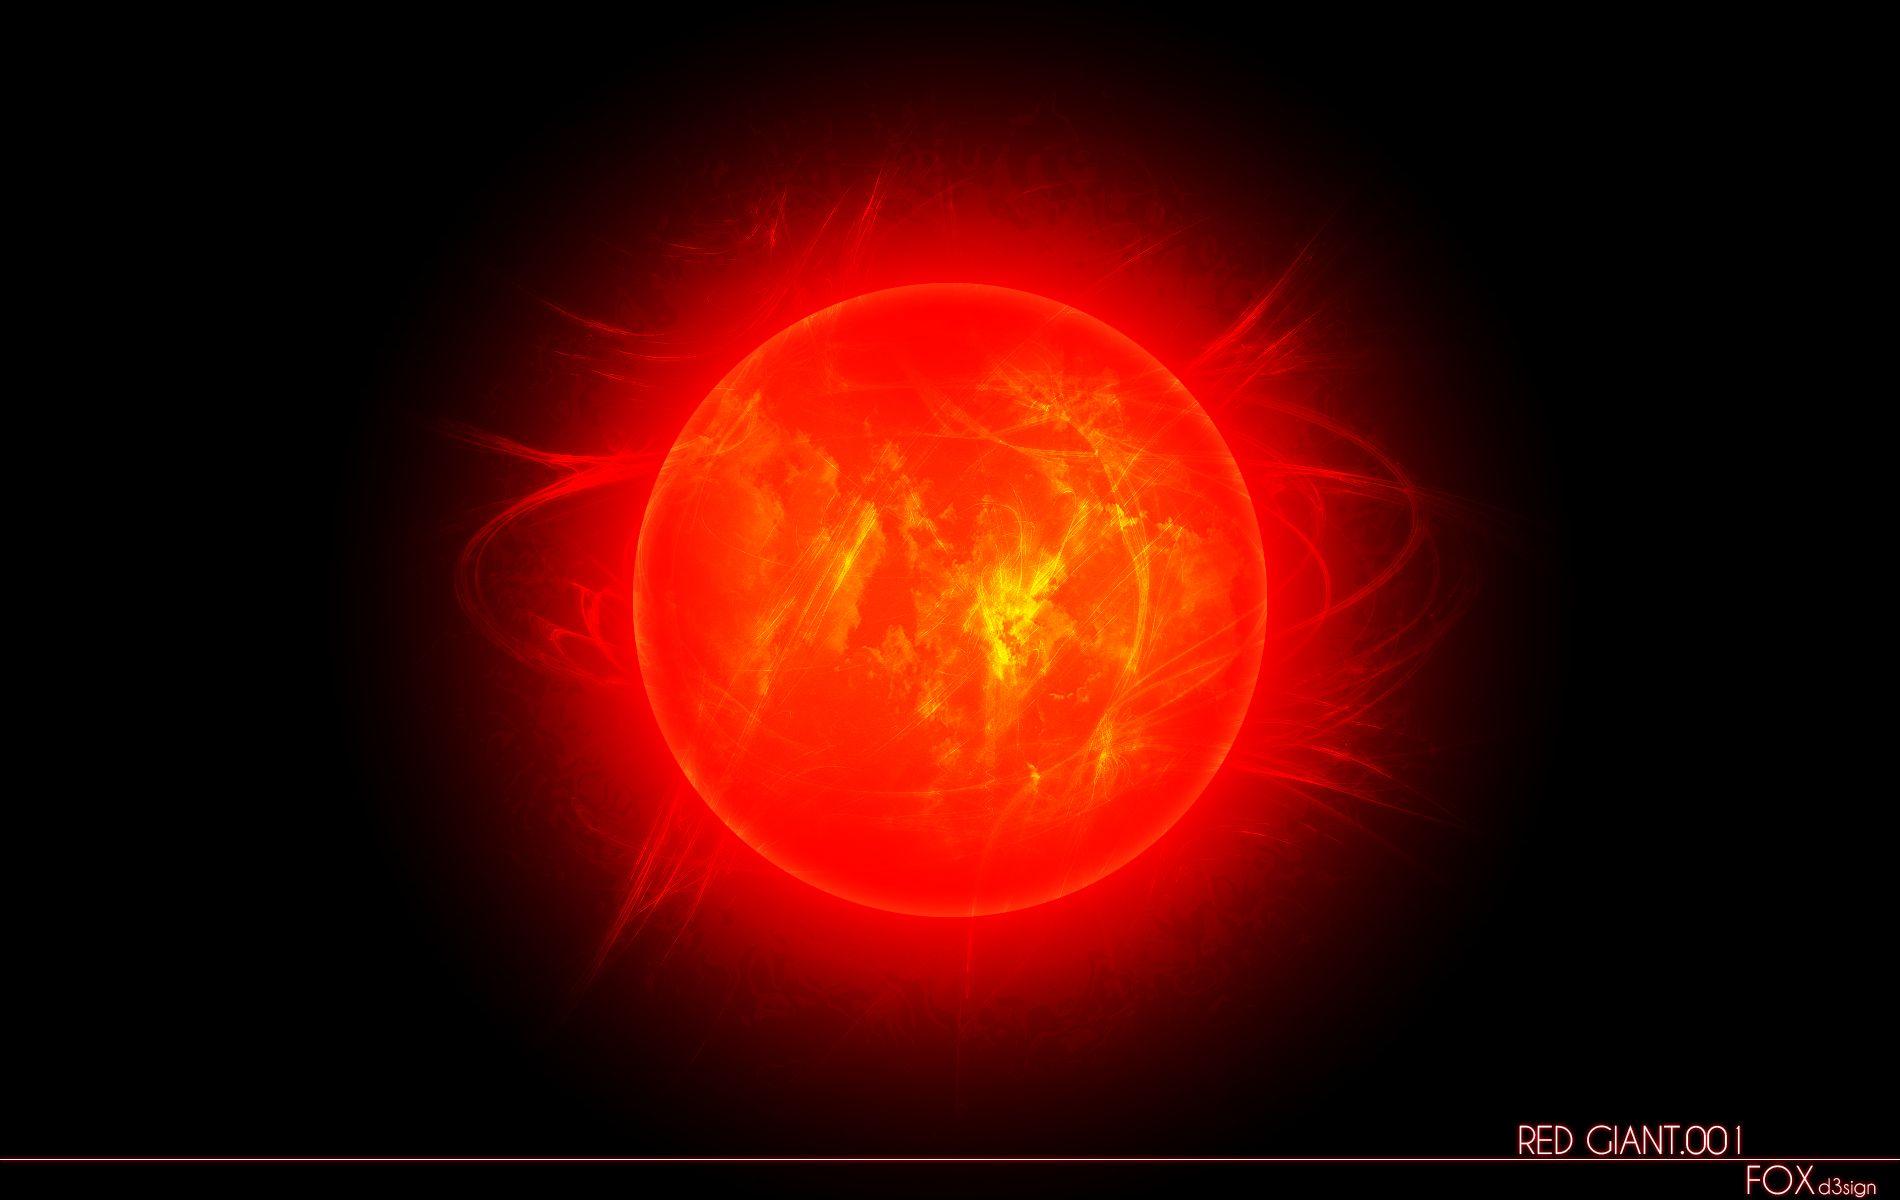 red giant sun - HD1900×1200